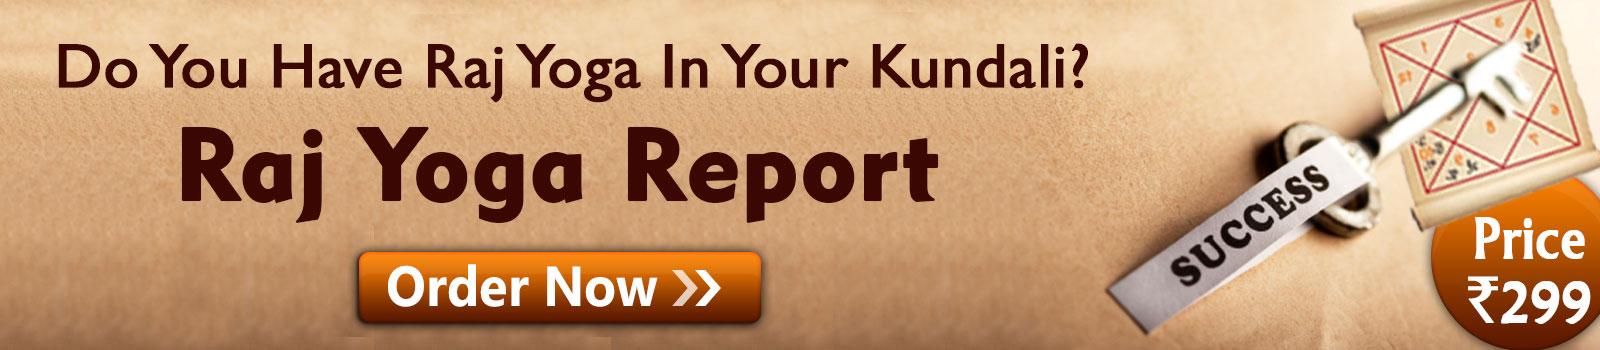 http://buy.astrosage.com/service/raj-yoga-report?prtnr_id=BLGEN